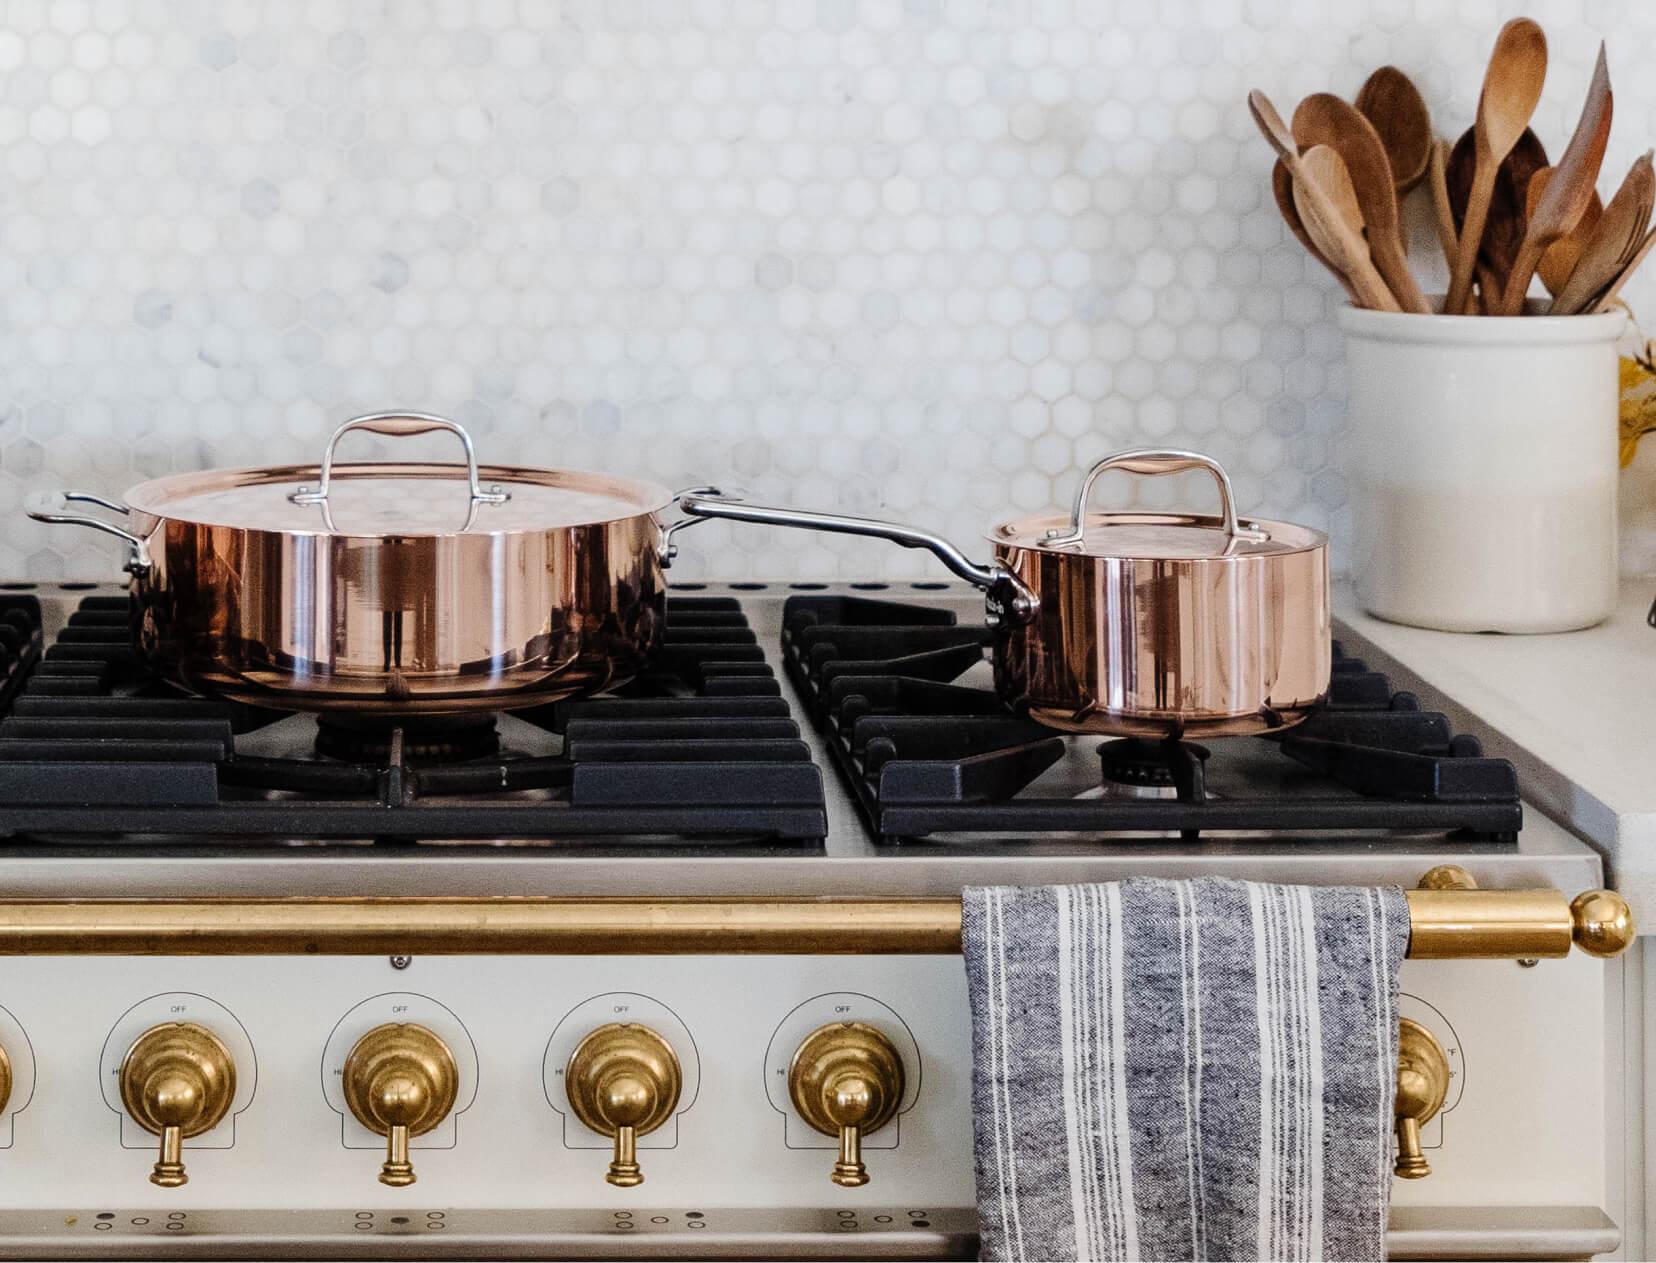 pans on stove